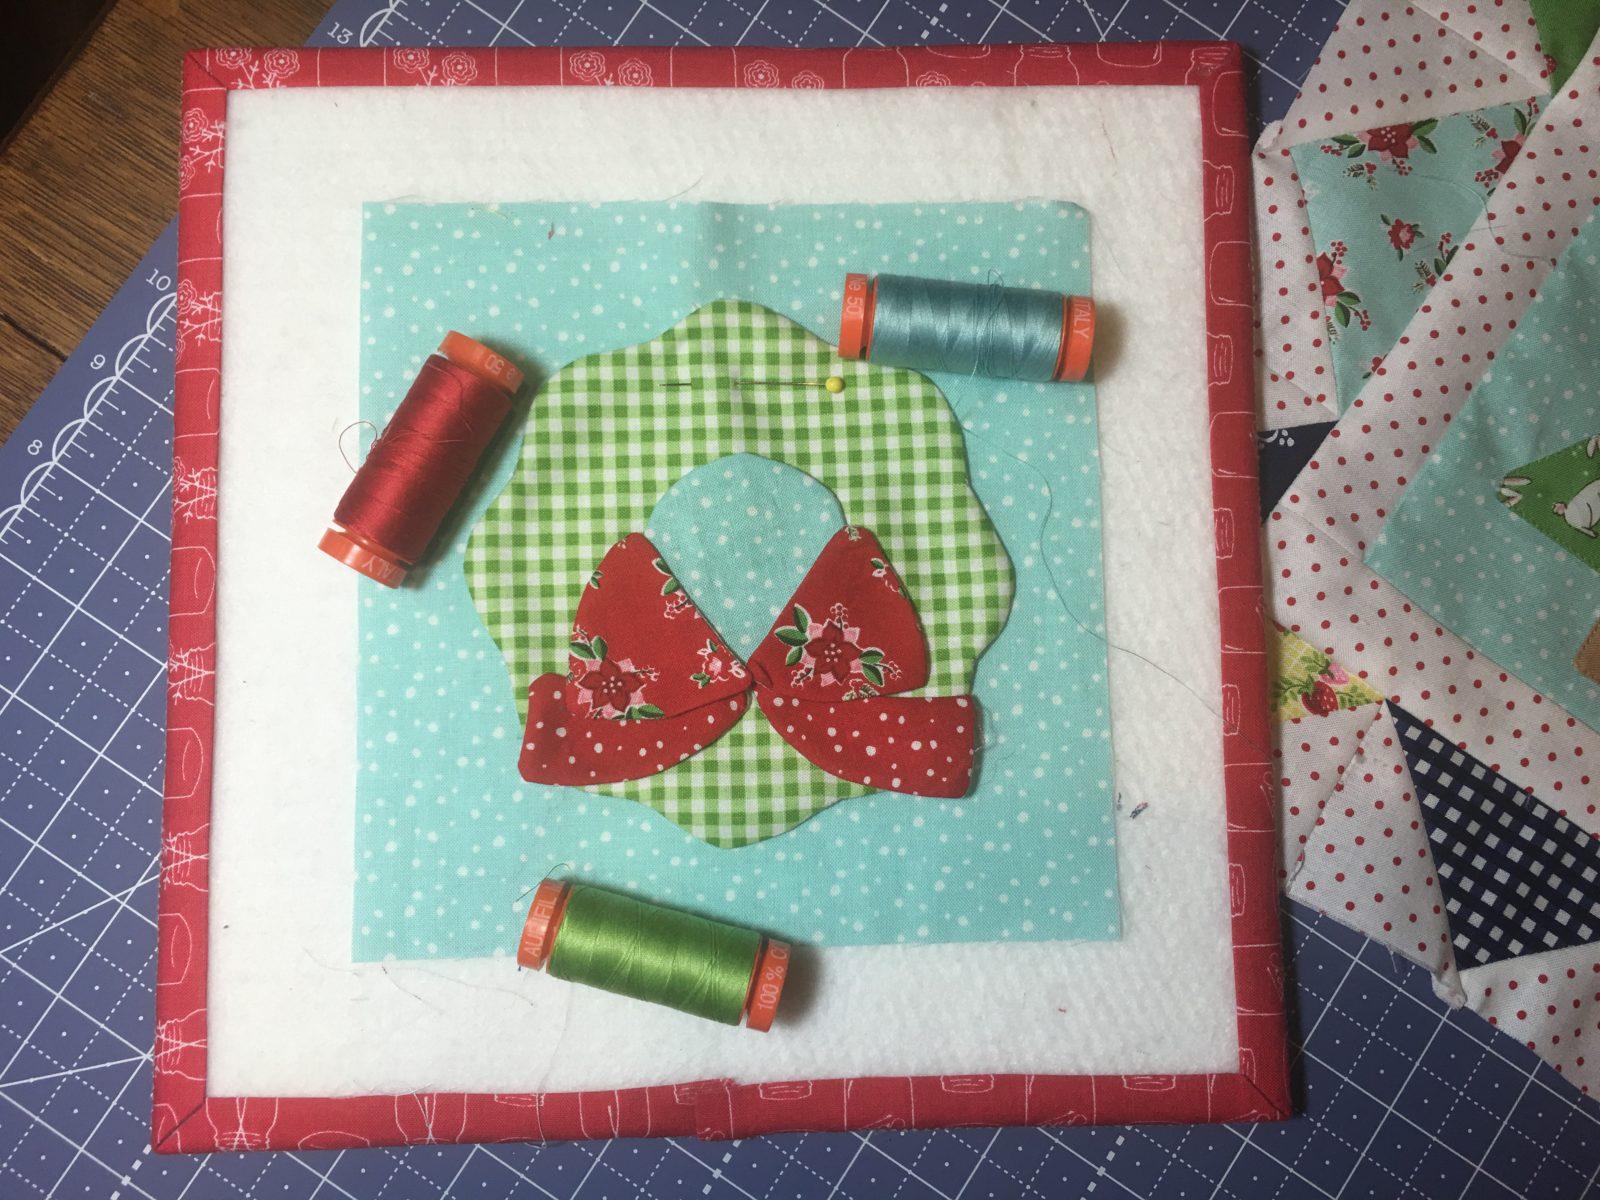 Cozy Christmas Wreath Block with Aurifil thread to applique